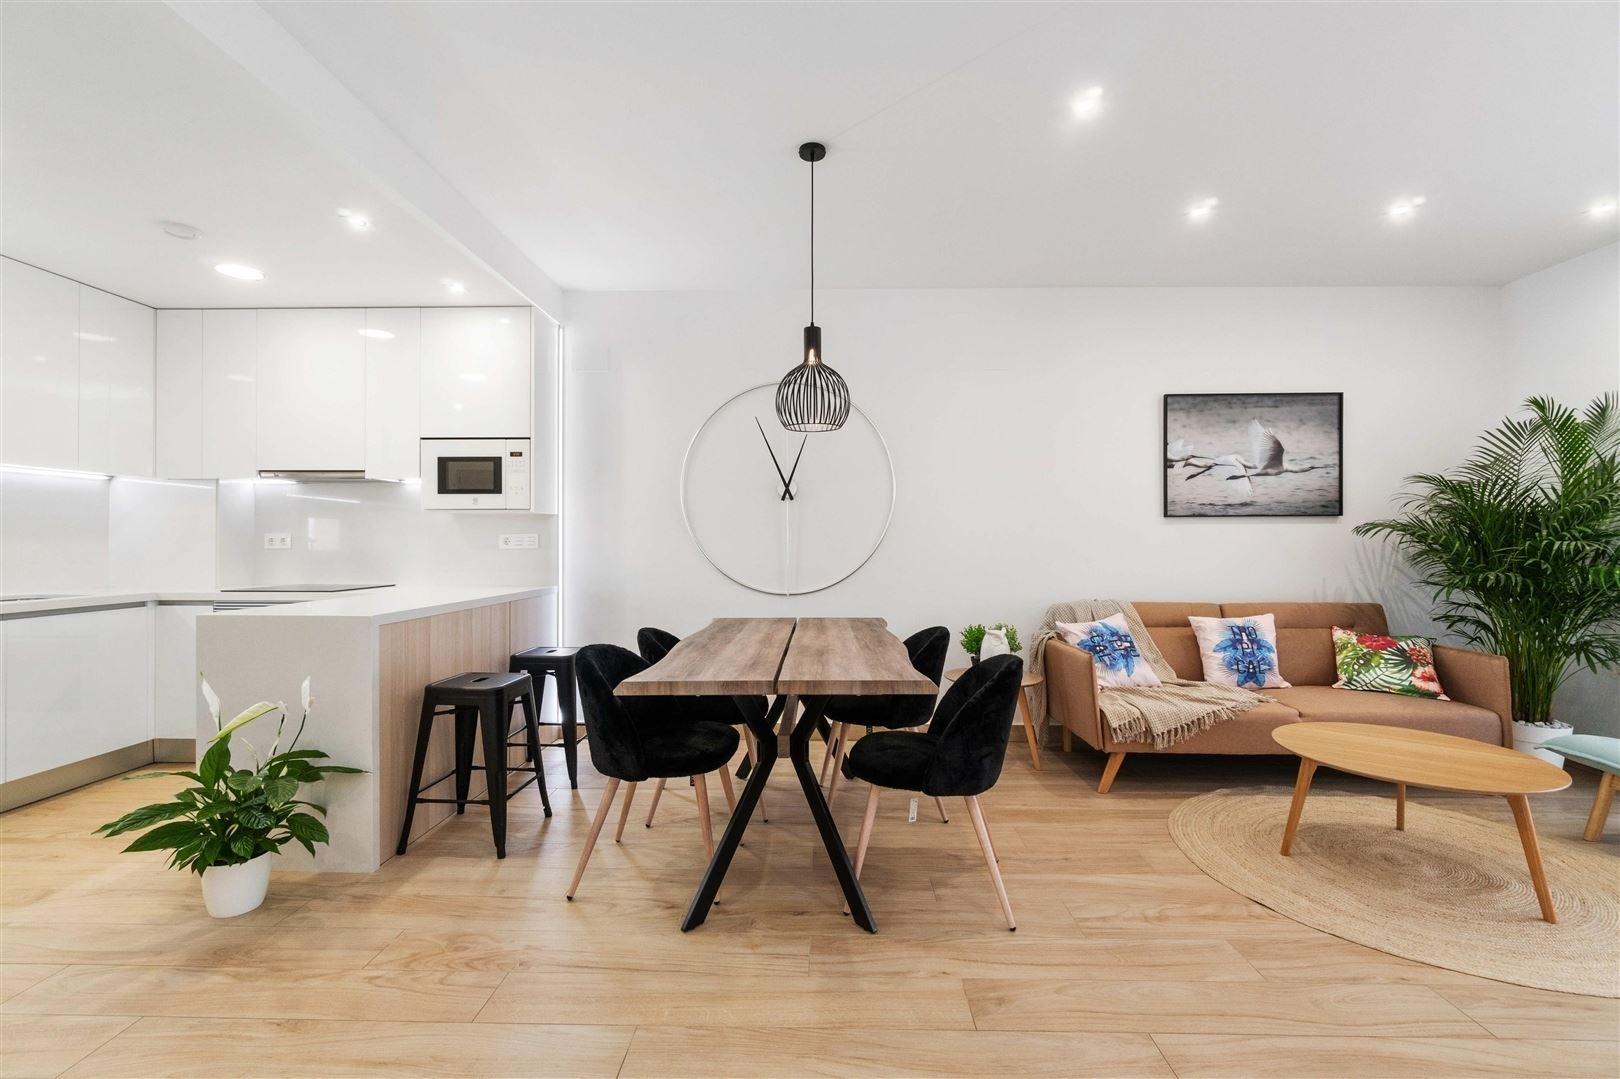 Foto 2 : Appartement te   (Spanje) - Prijs € 169.900